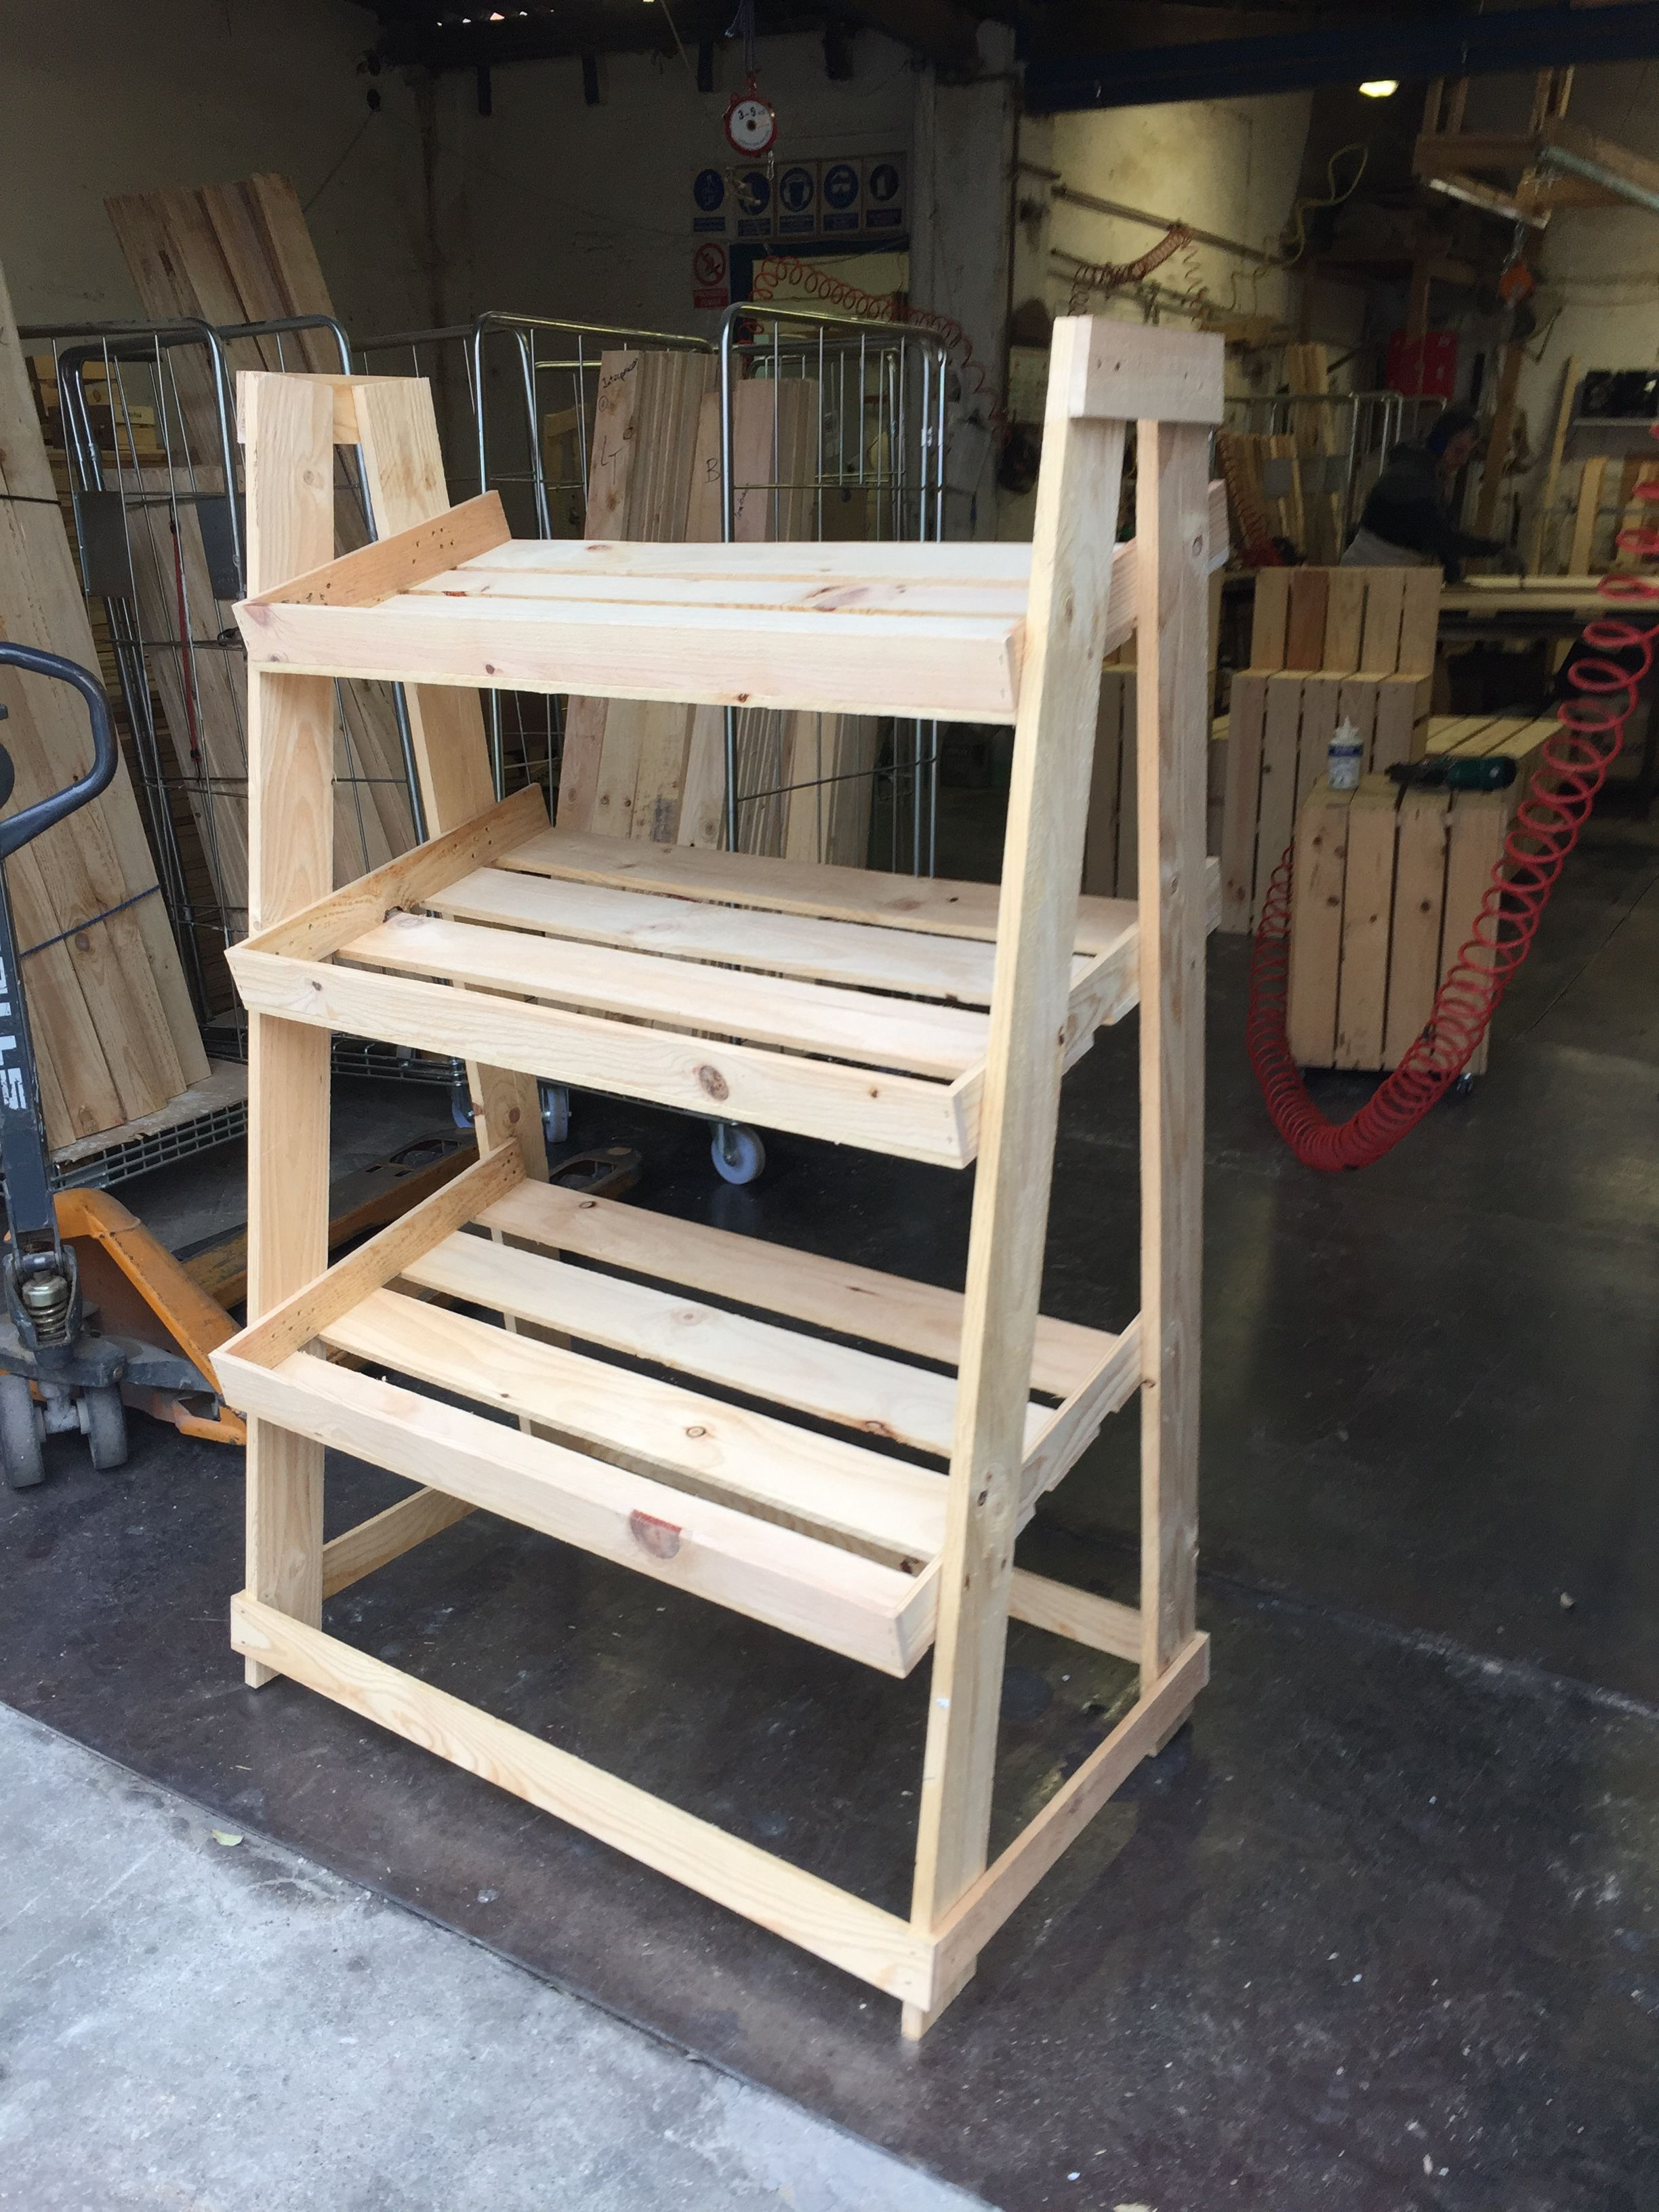 Mueble expositor para fruterías. | Cajas de madera | Pinterest ...